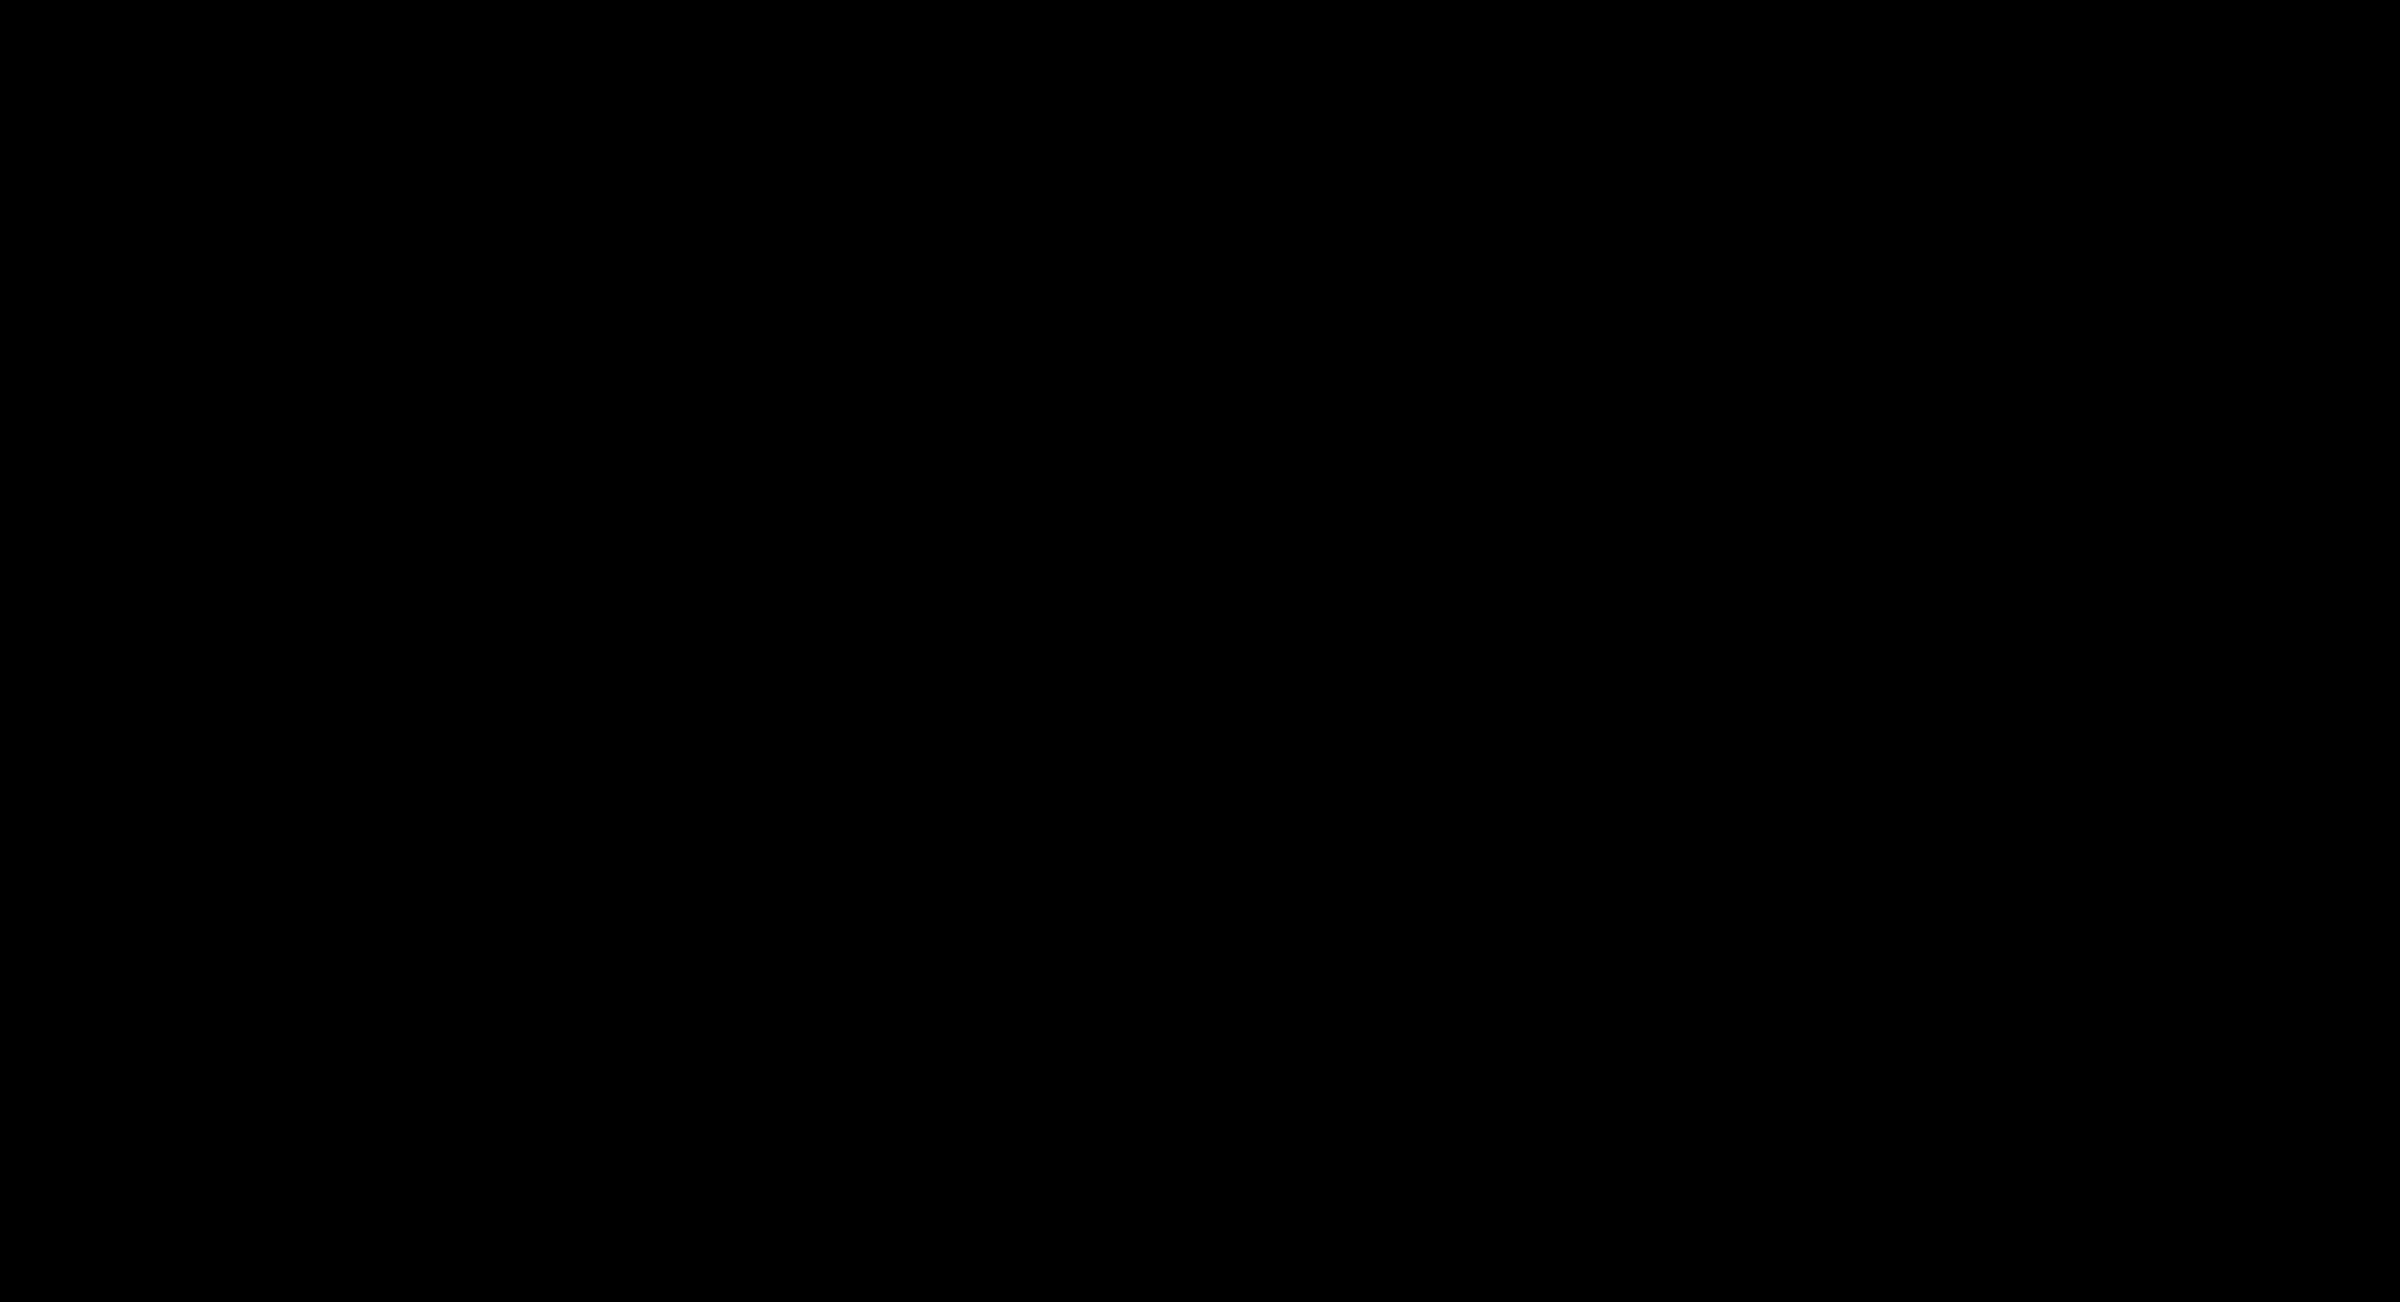 Clipart gun hand gun. Revolver silhouette big image